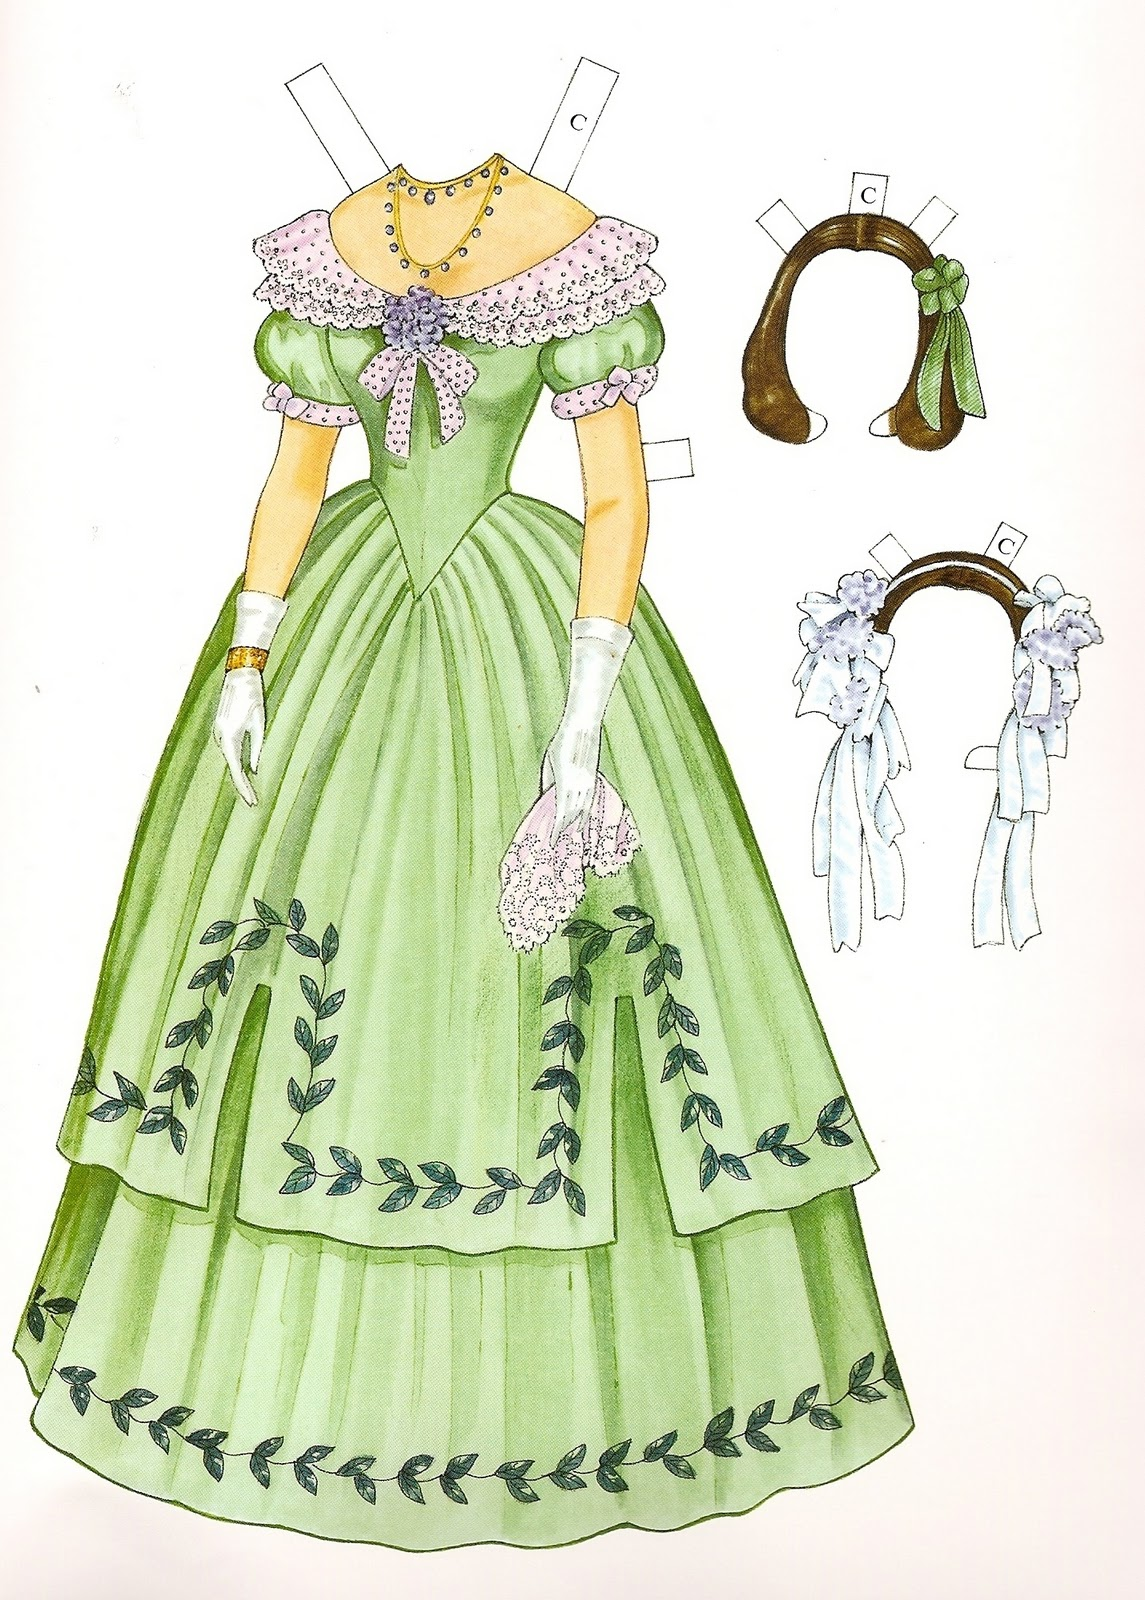 Godey's Early Victorian Fashions - Charlotte (1838 - 1858) | Gabi's ...: gabipaperdolls.blogspot.com/2010/12/charlotte-1838-1858.html#!